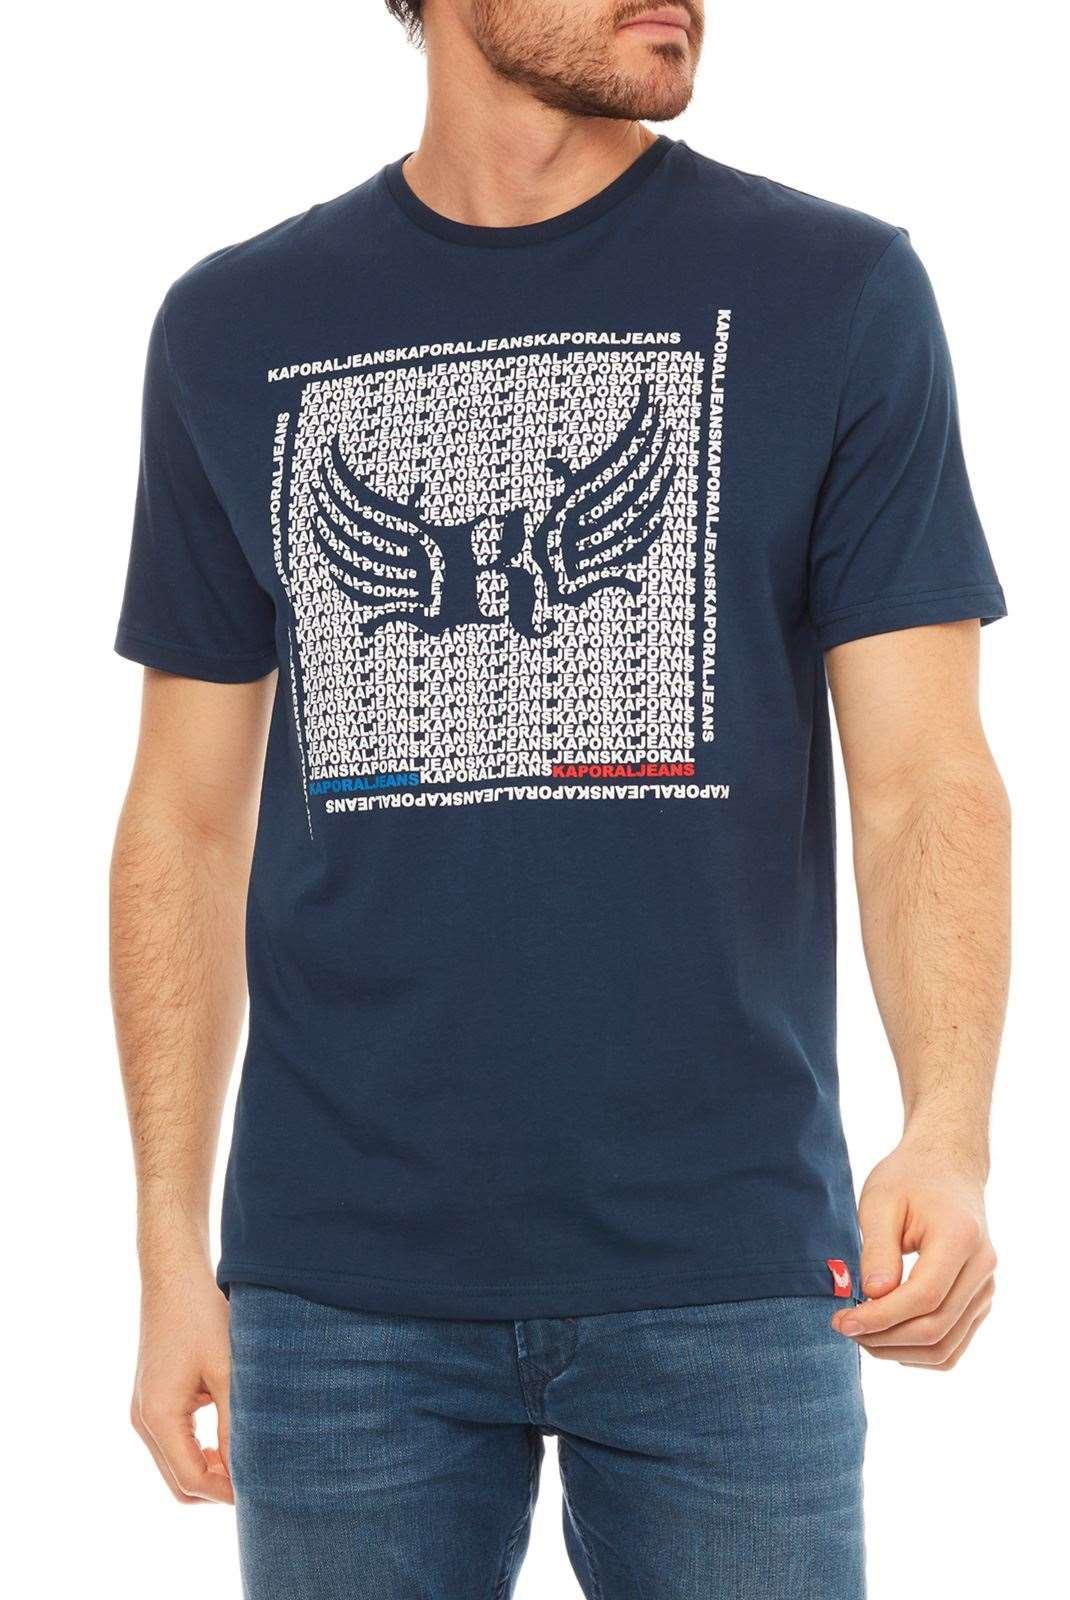 Tee-shirts  Kaporal PASTO BLUE US